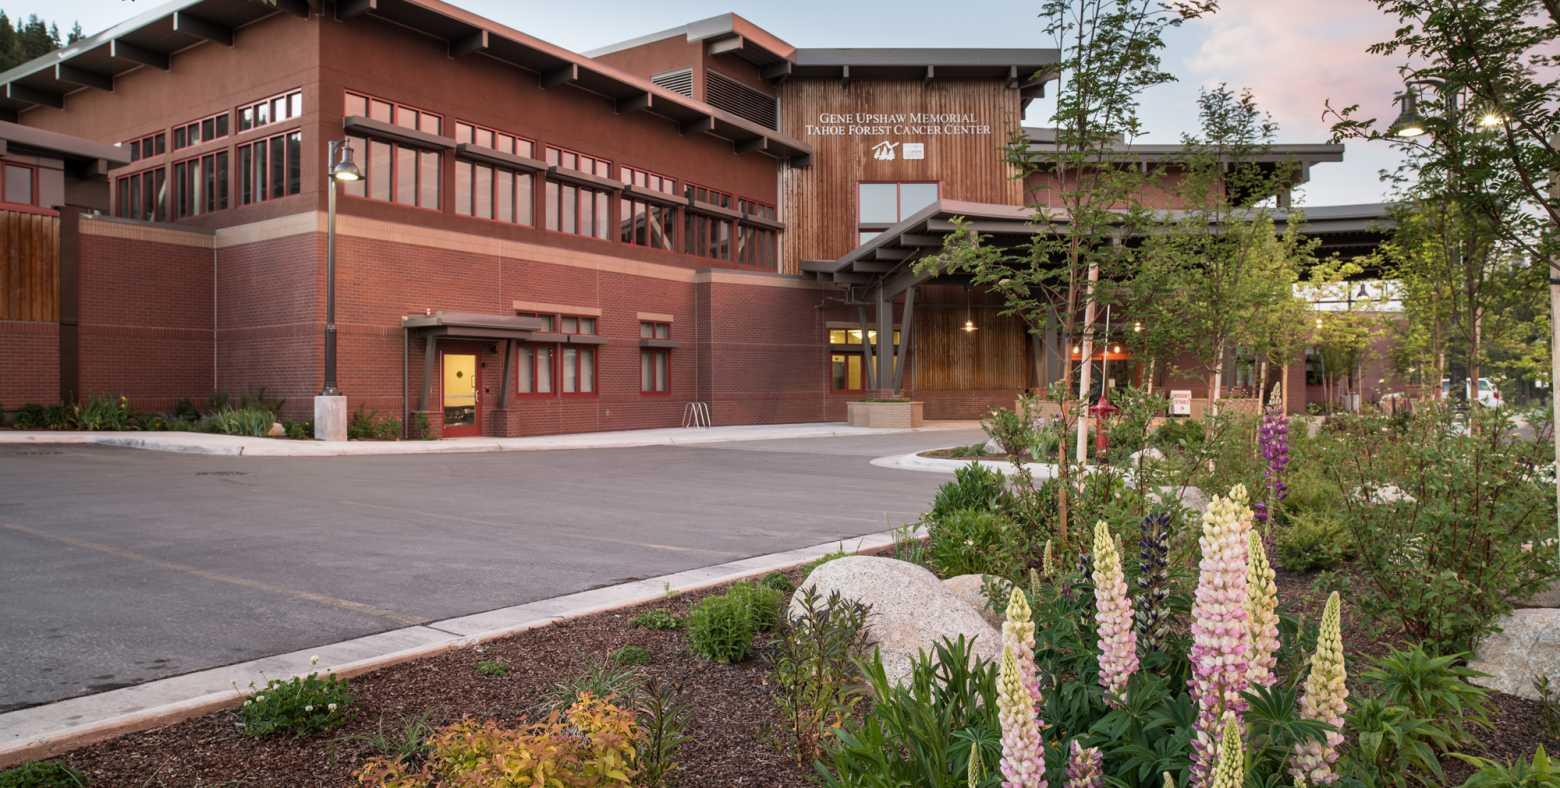 Gene Upshaw Memorial Tahoe Forest Cancer Center exterior